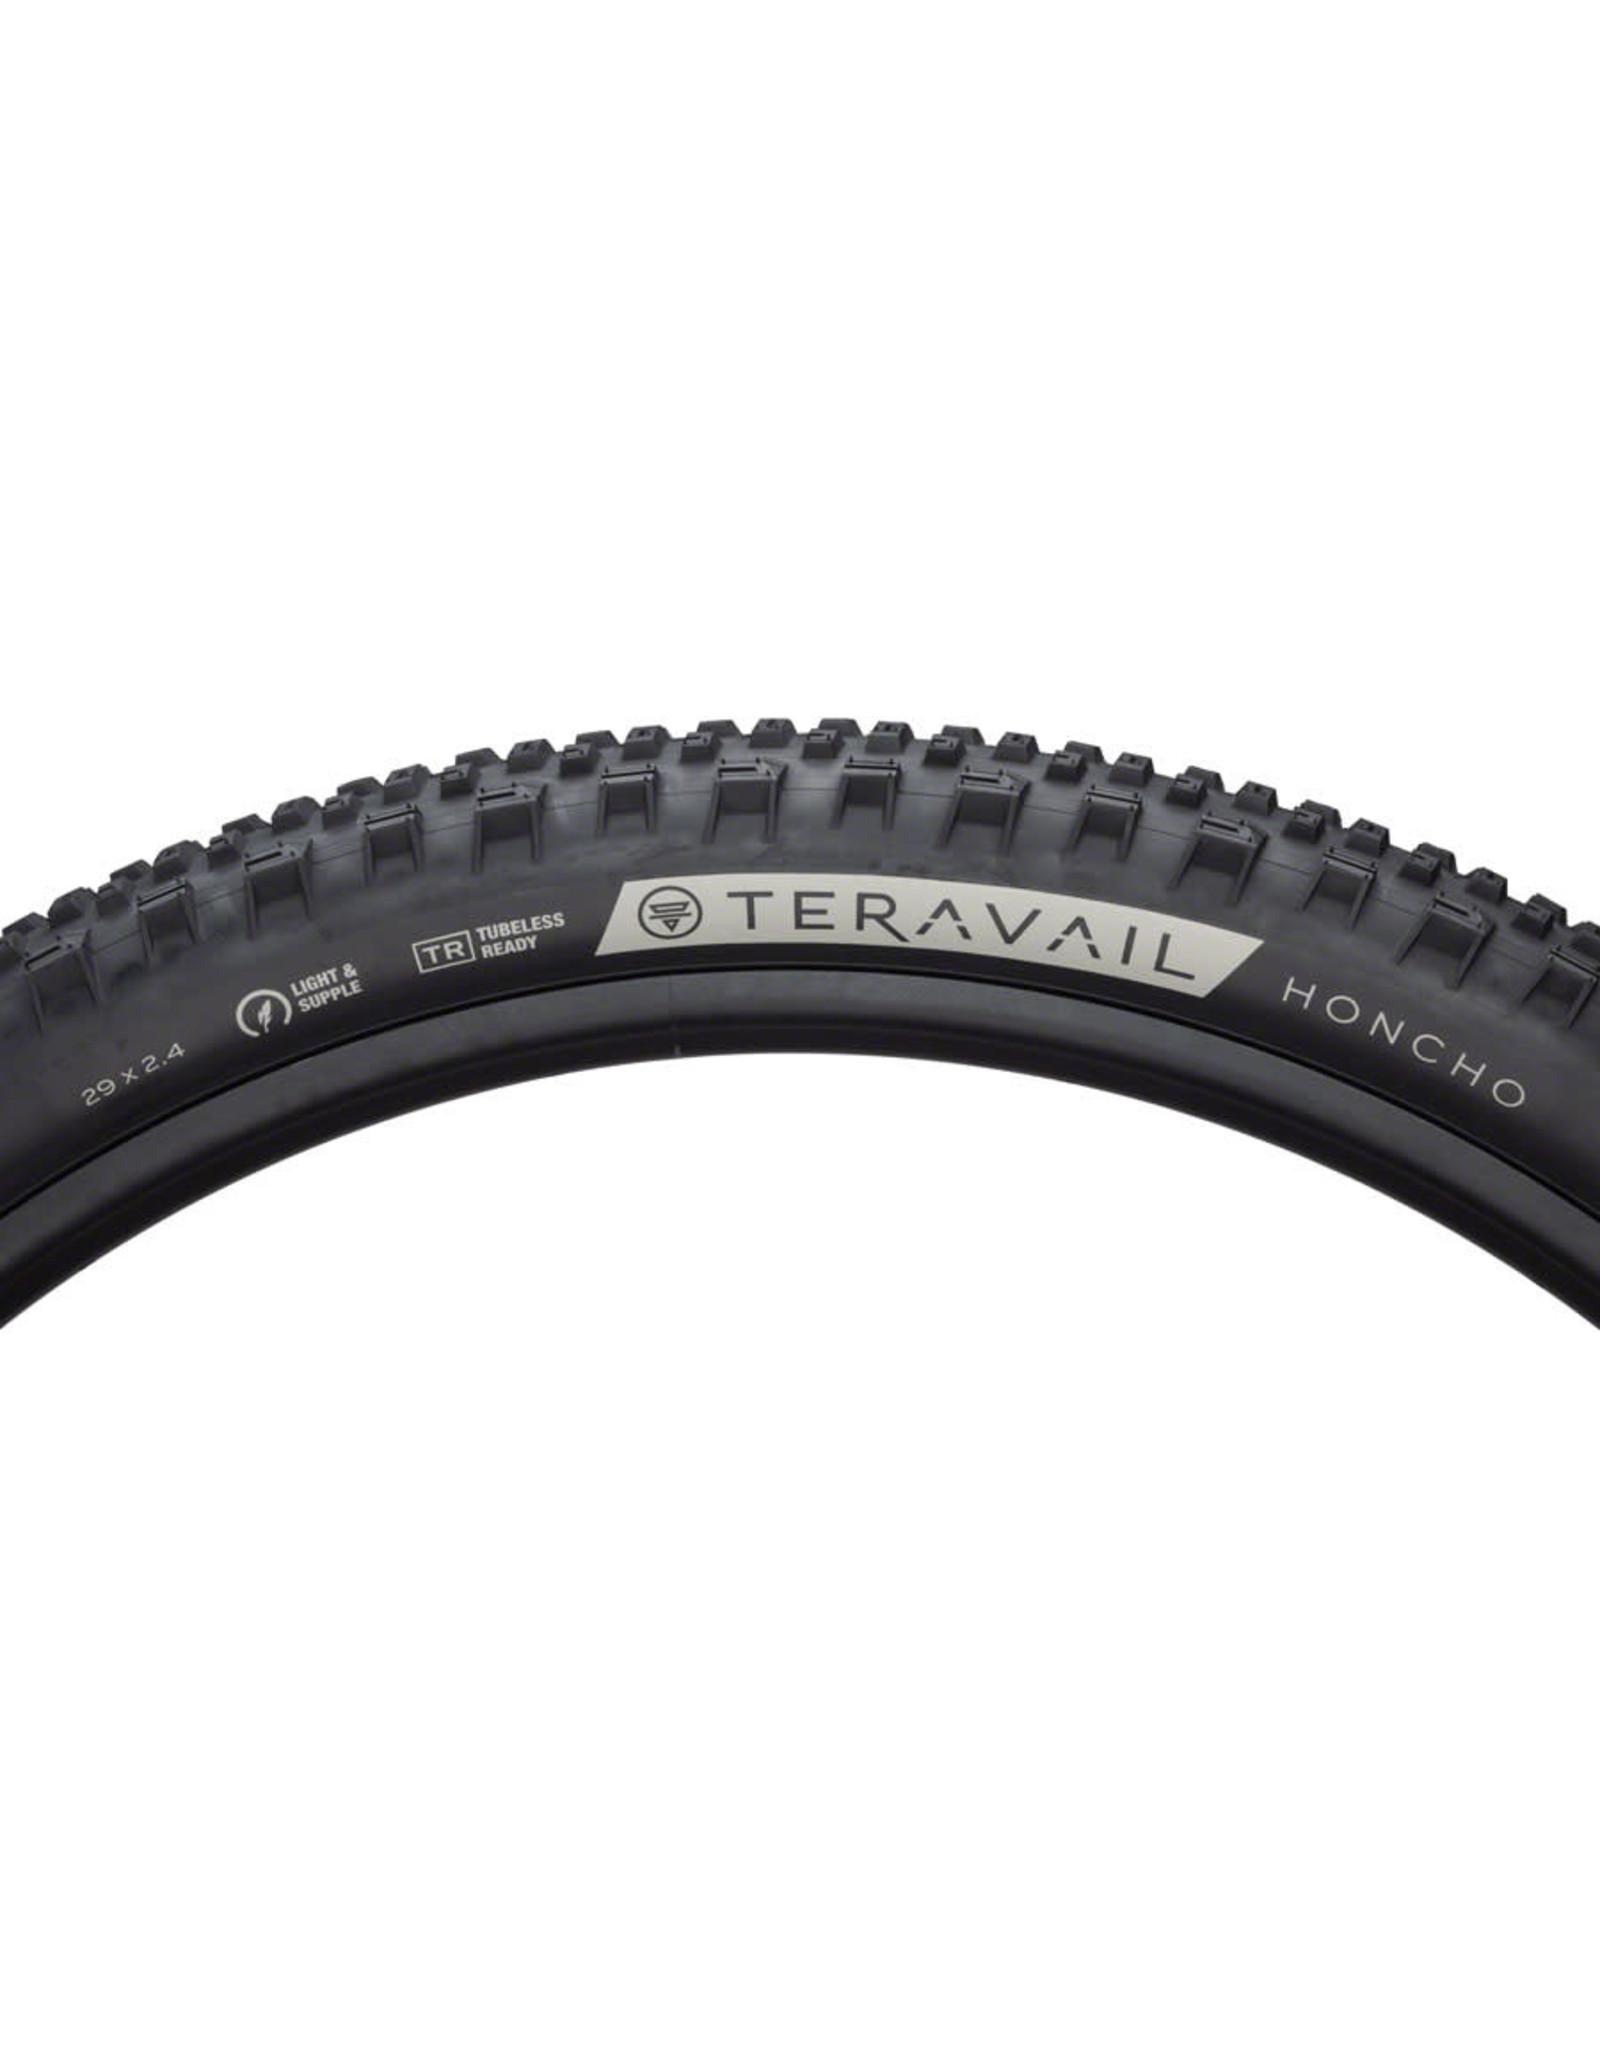 Teravail Teravail Honcho Tire - 29 x 2.4, Tubeless, Folding, Black, Durable